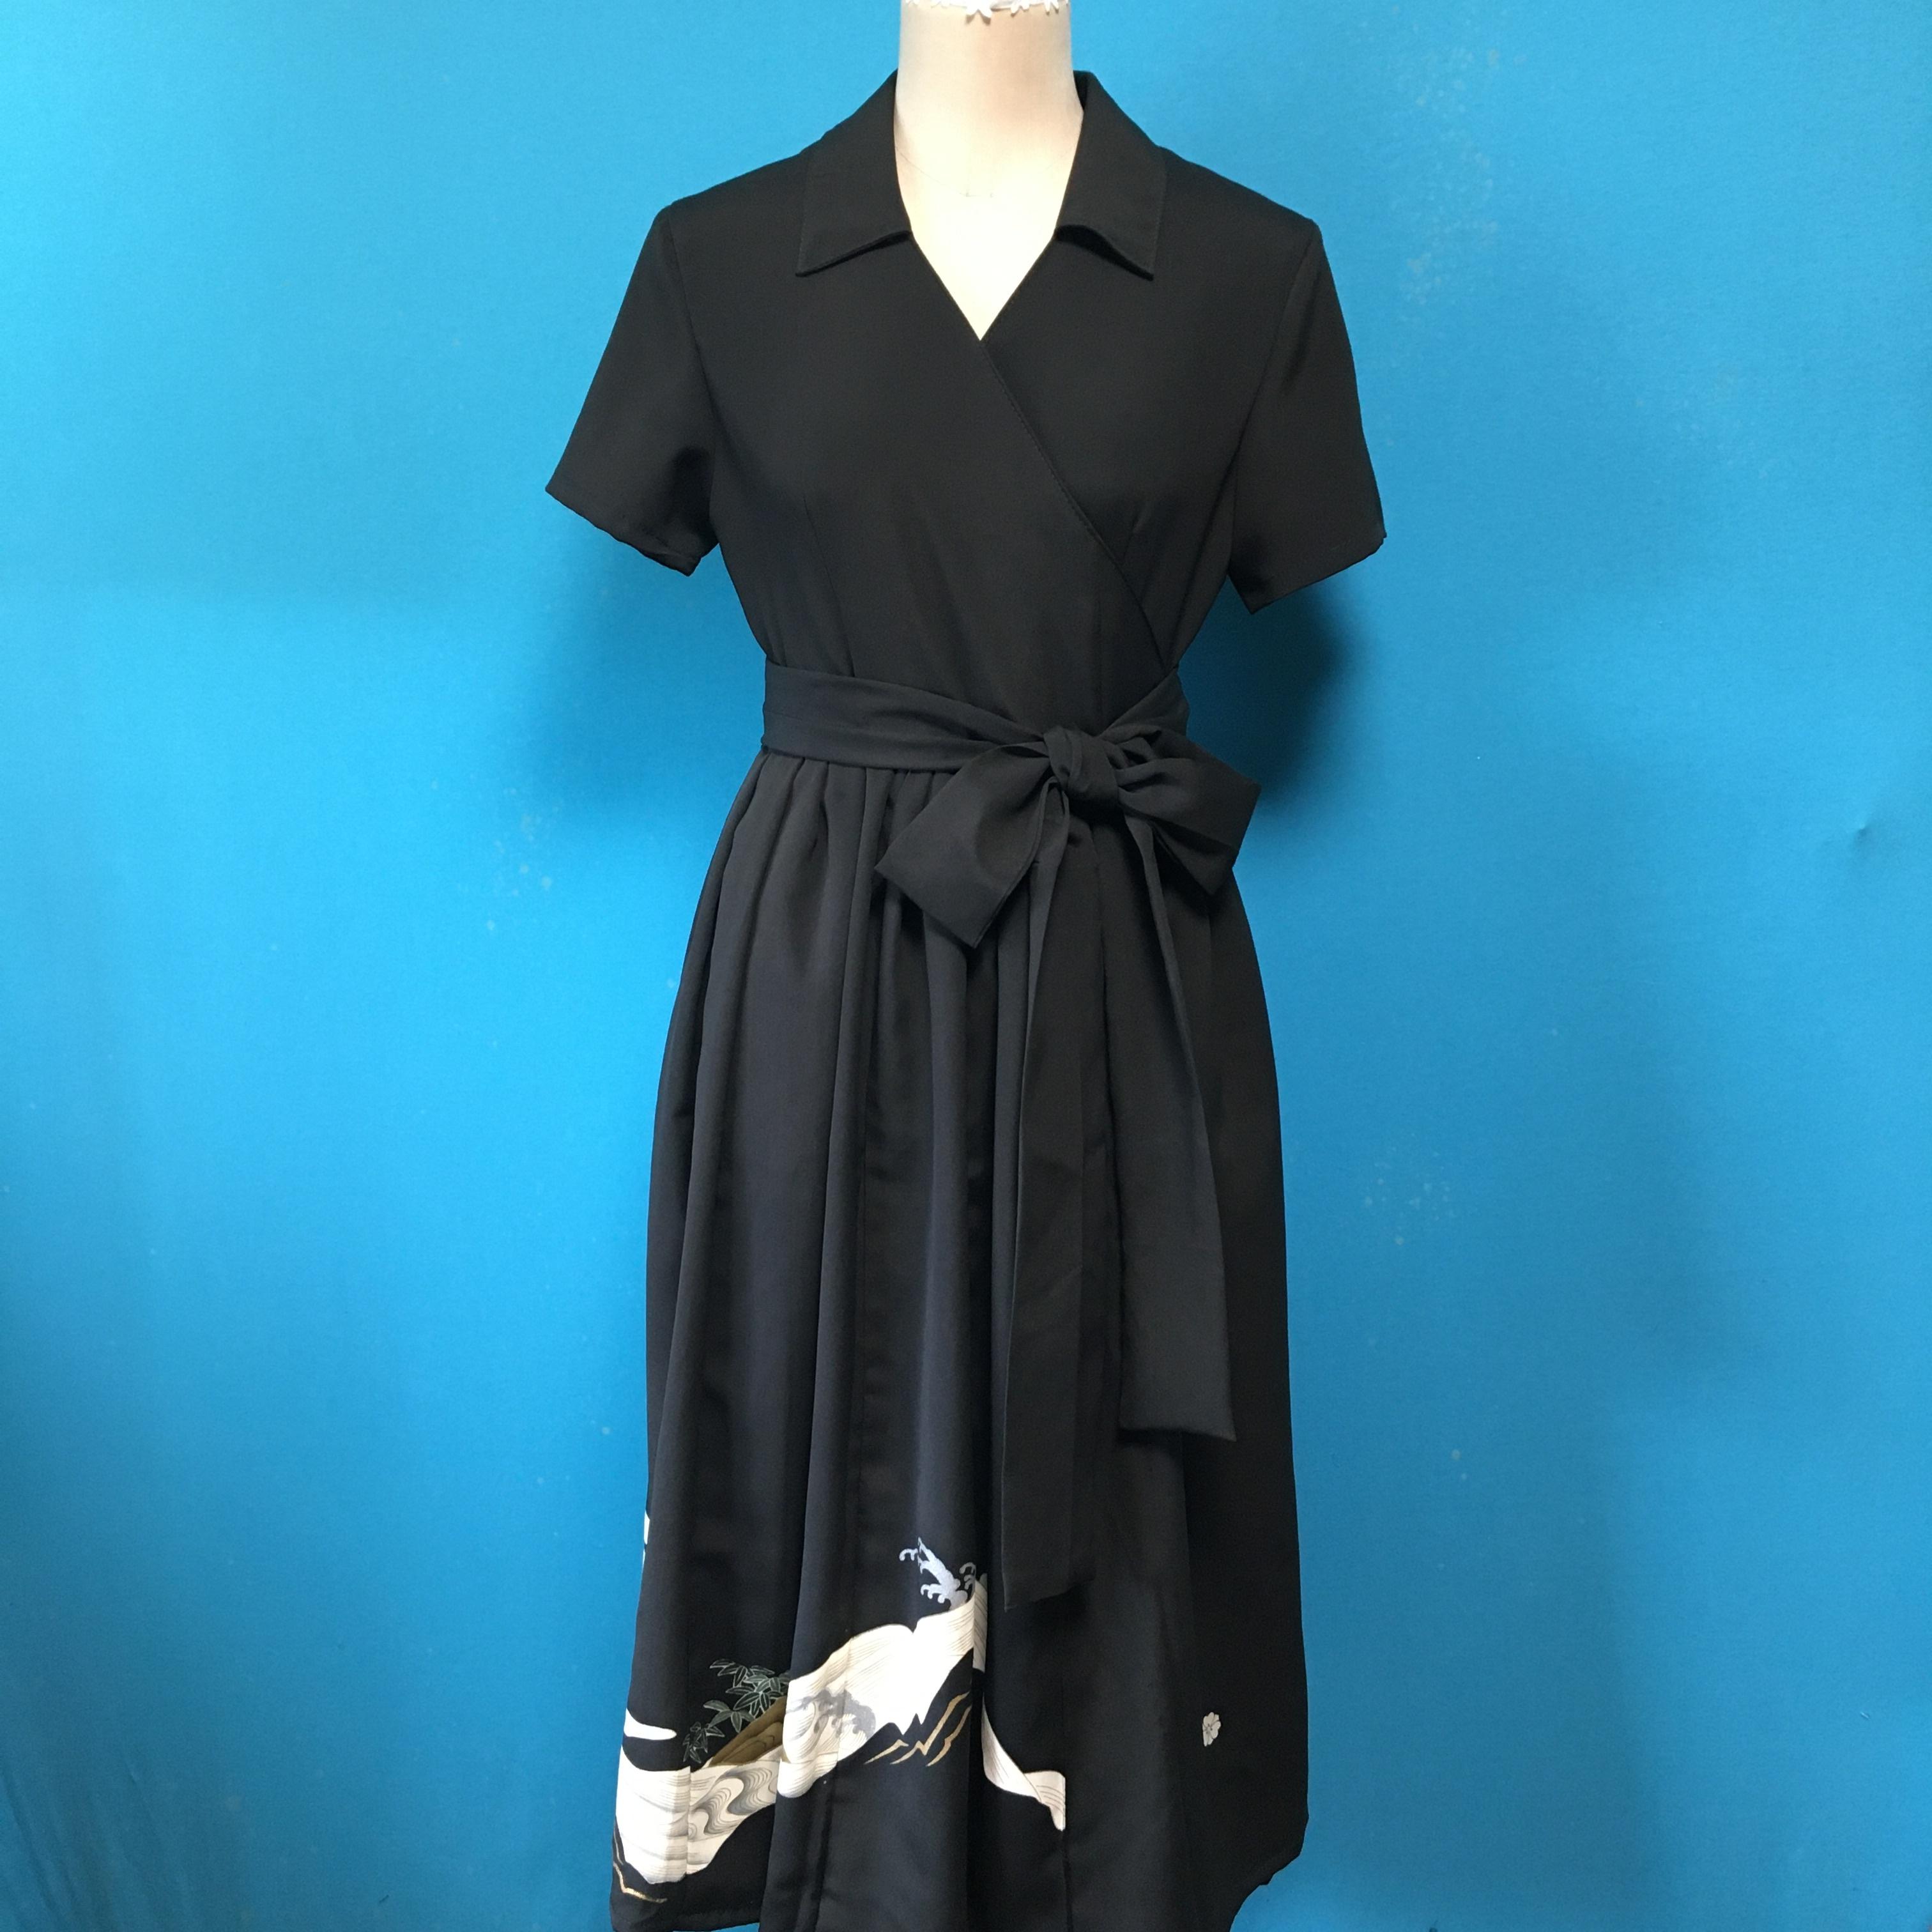 Vintage black wrap dress 古典刺繍